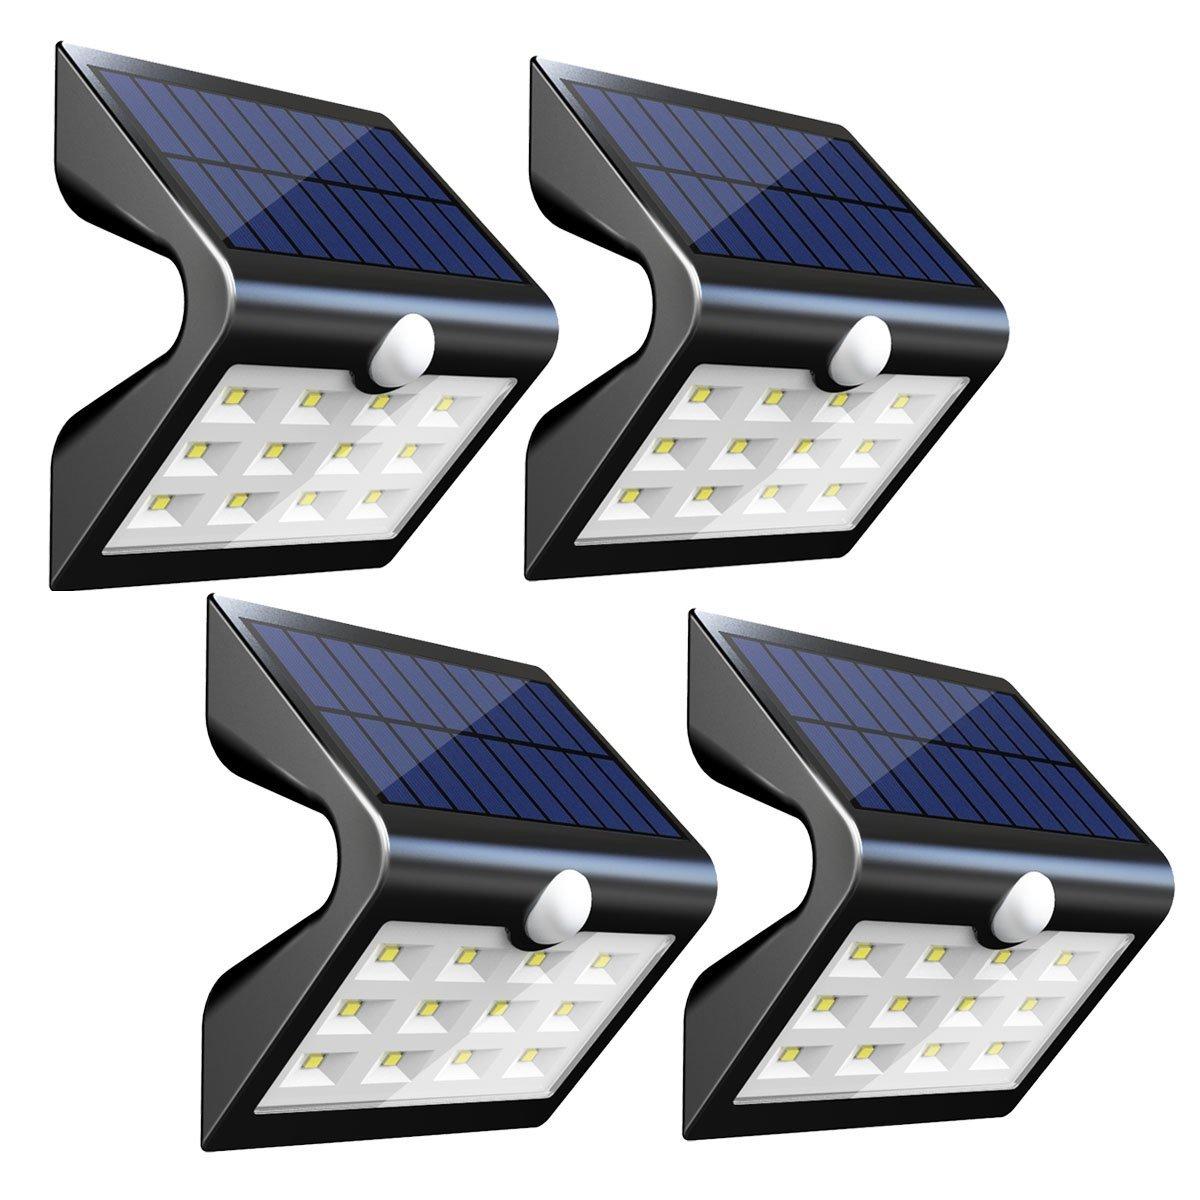 InnoGear 2nd Version 14 LED Solar Lights  $29.99 @amazon